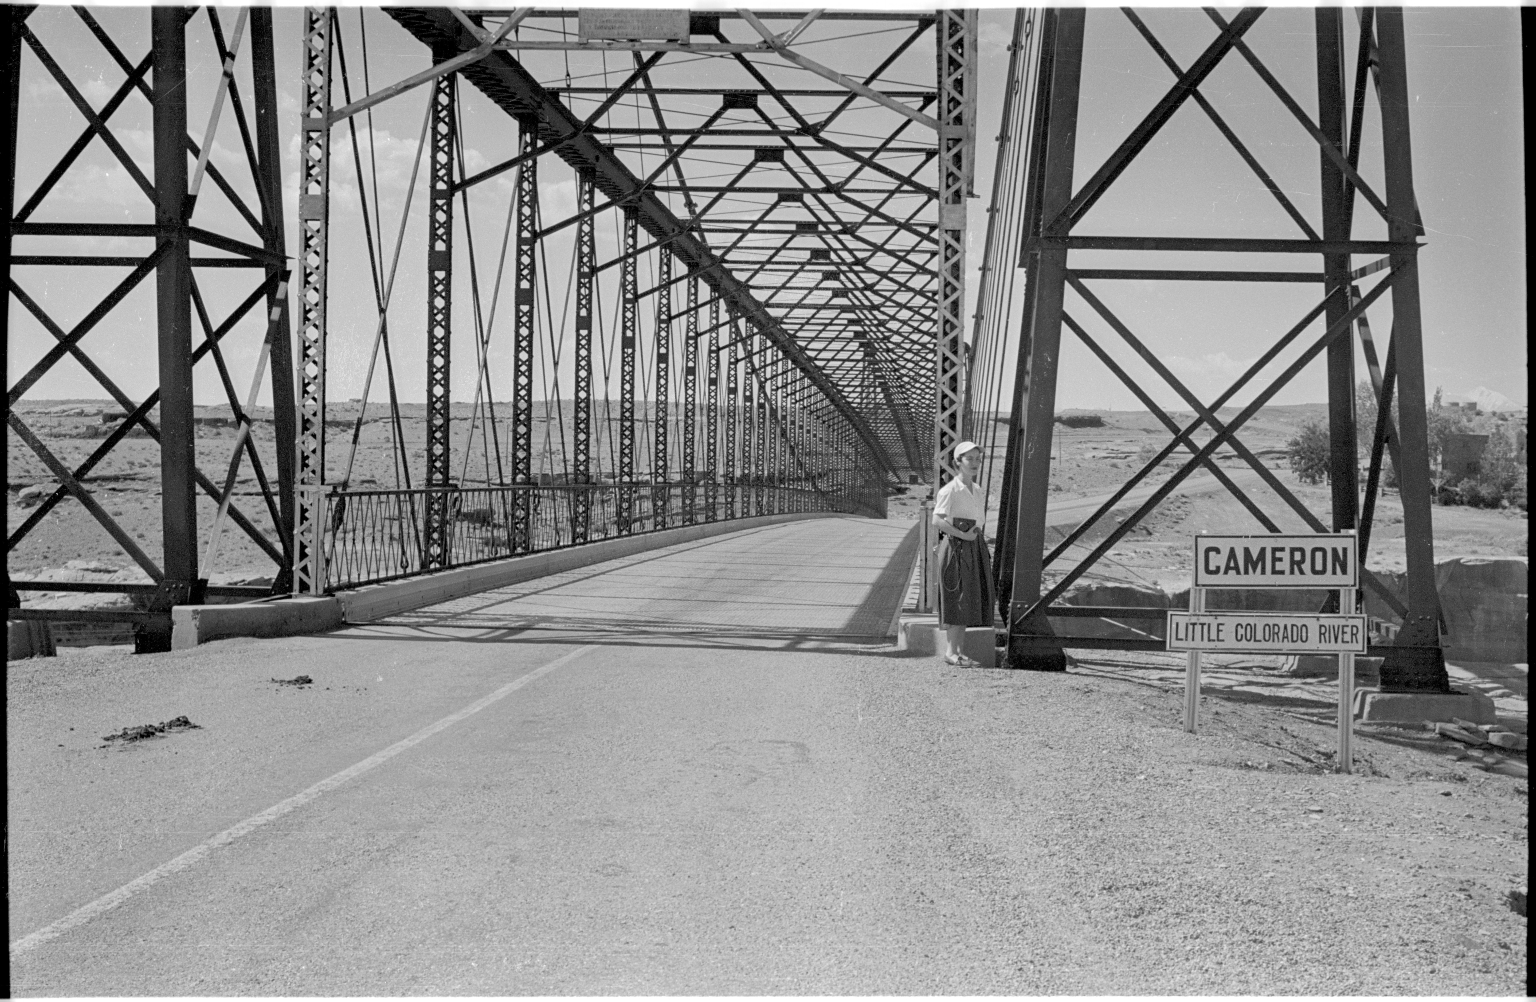 Cameron Suspension Bridge